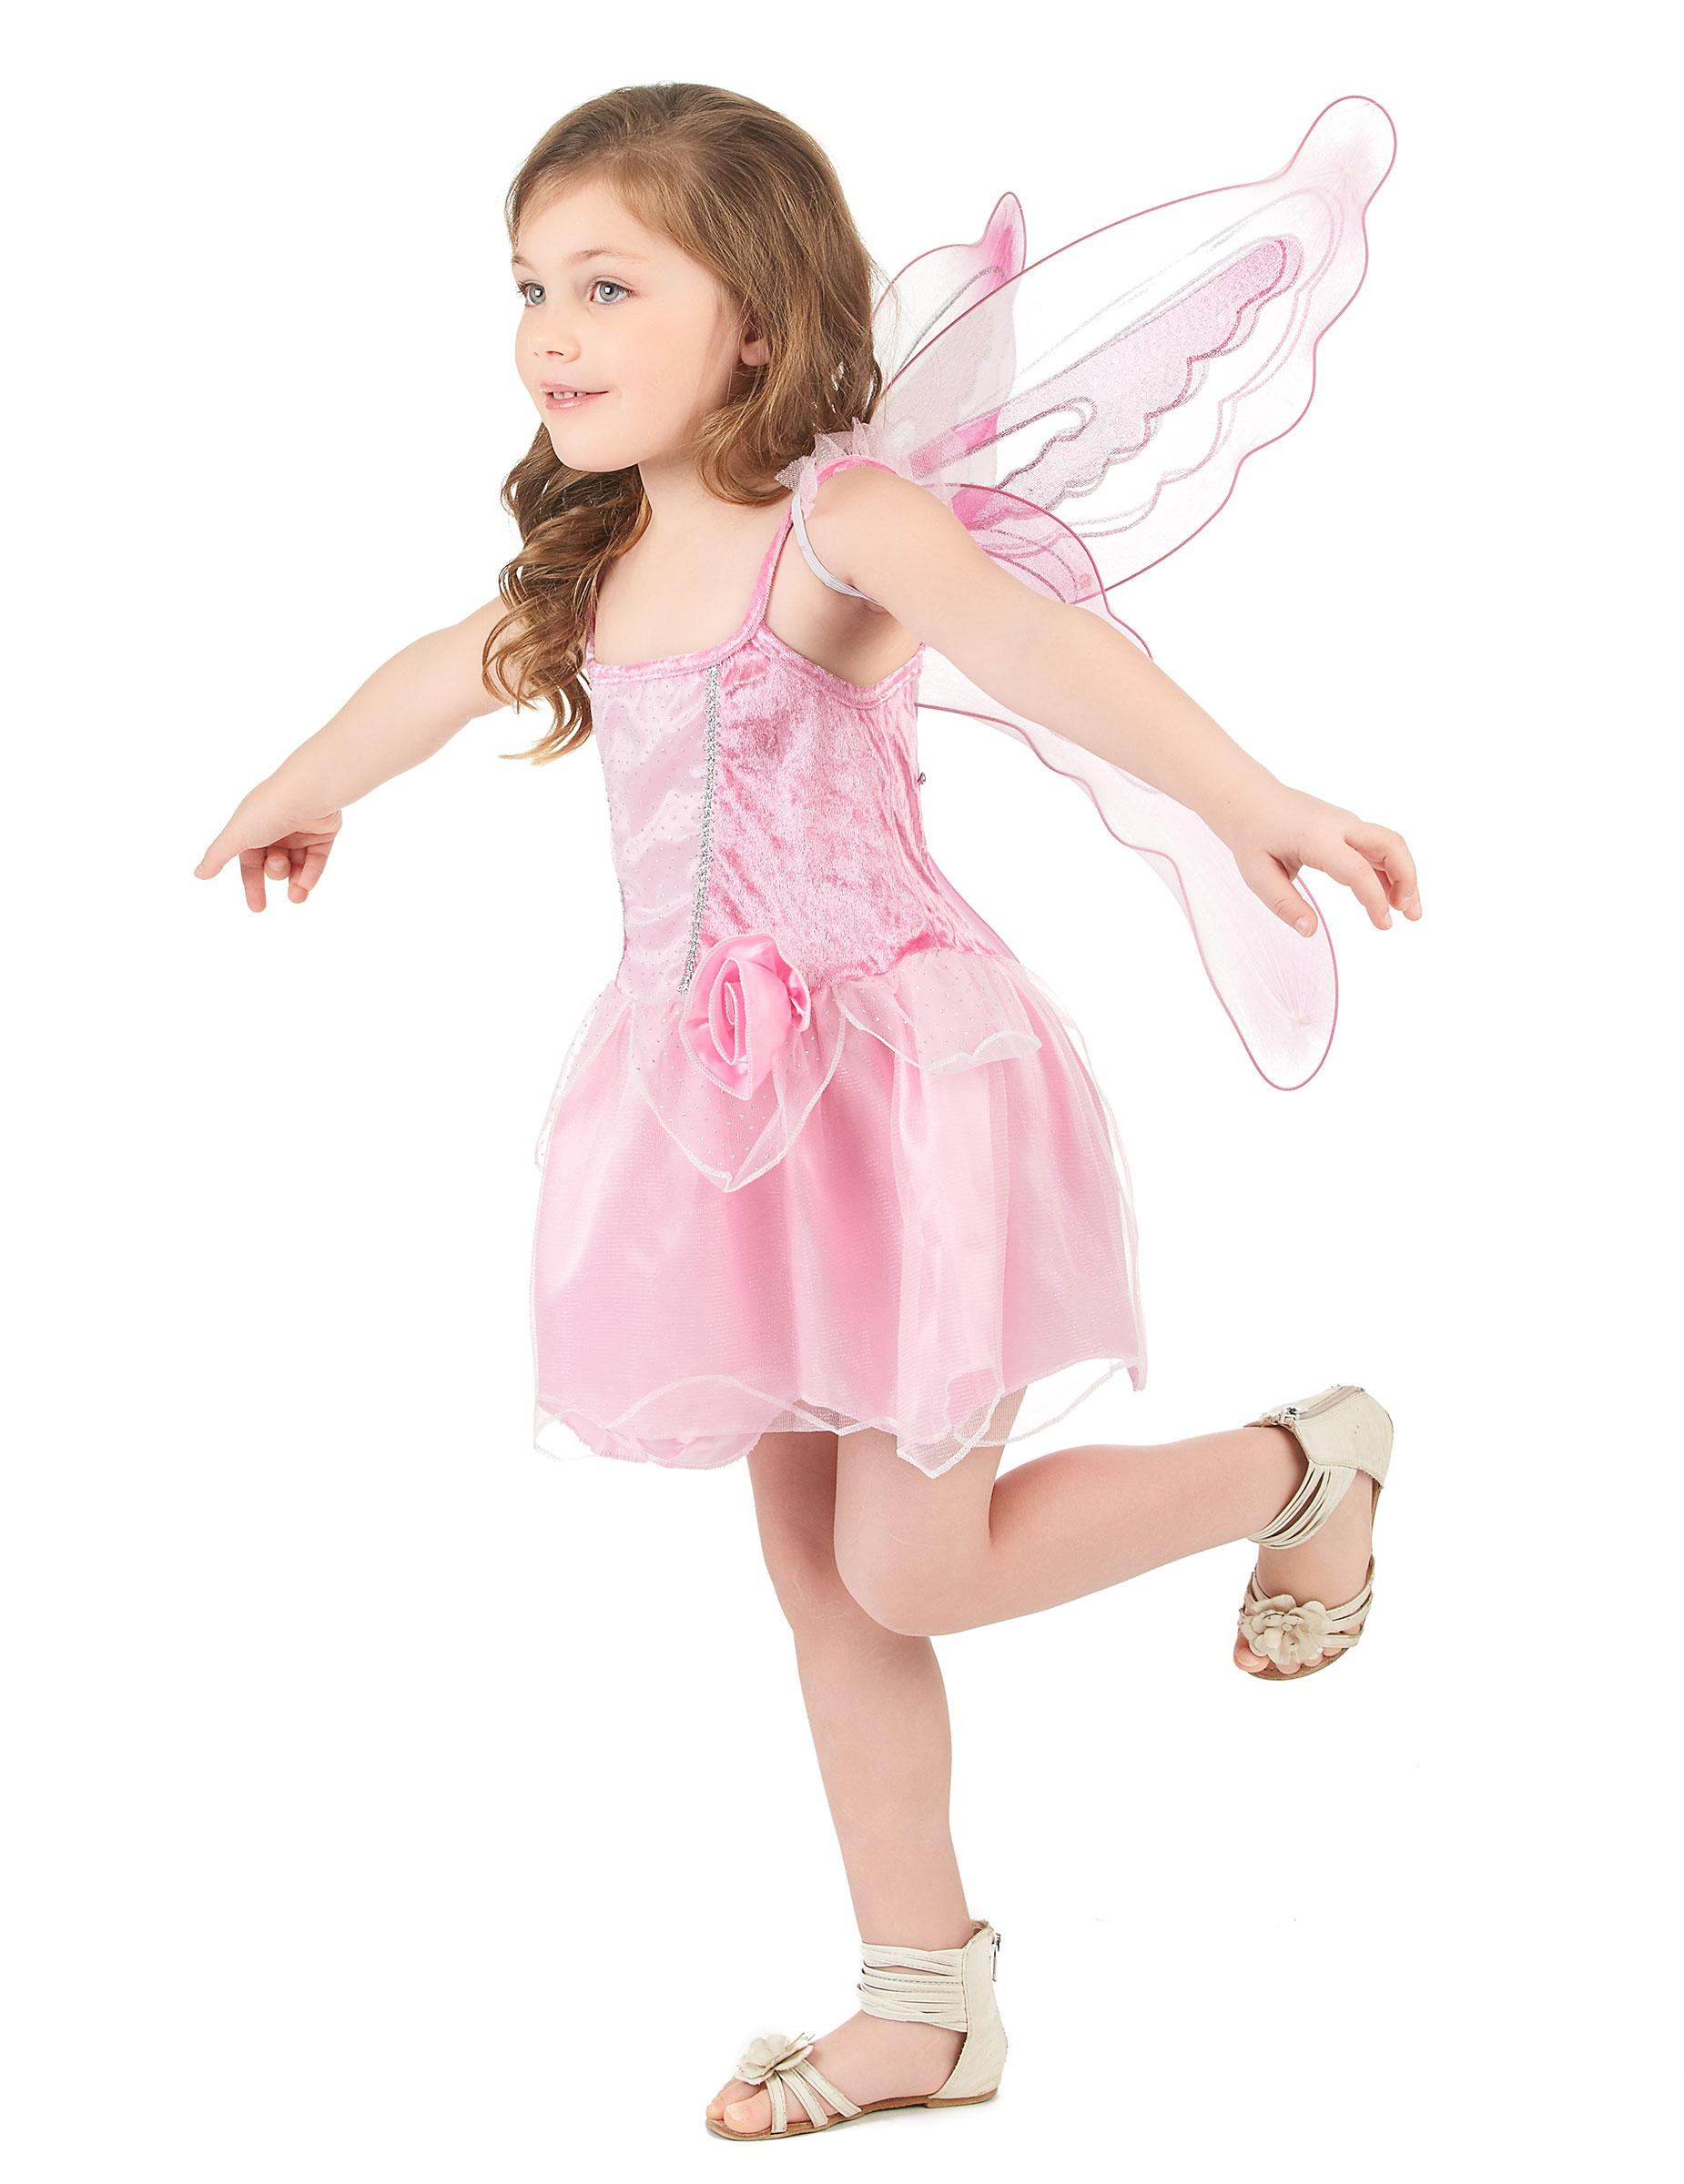 Costume da fatina rosa per bambina su VegaooParty 9a25d350530